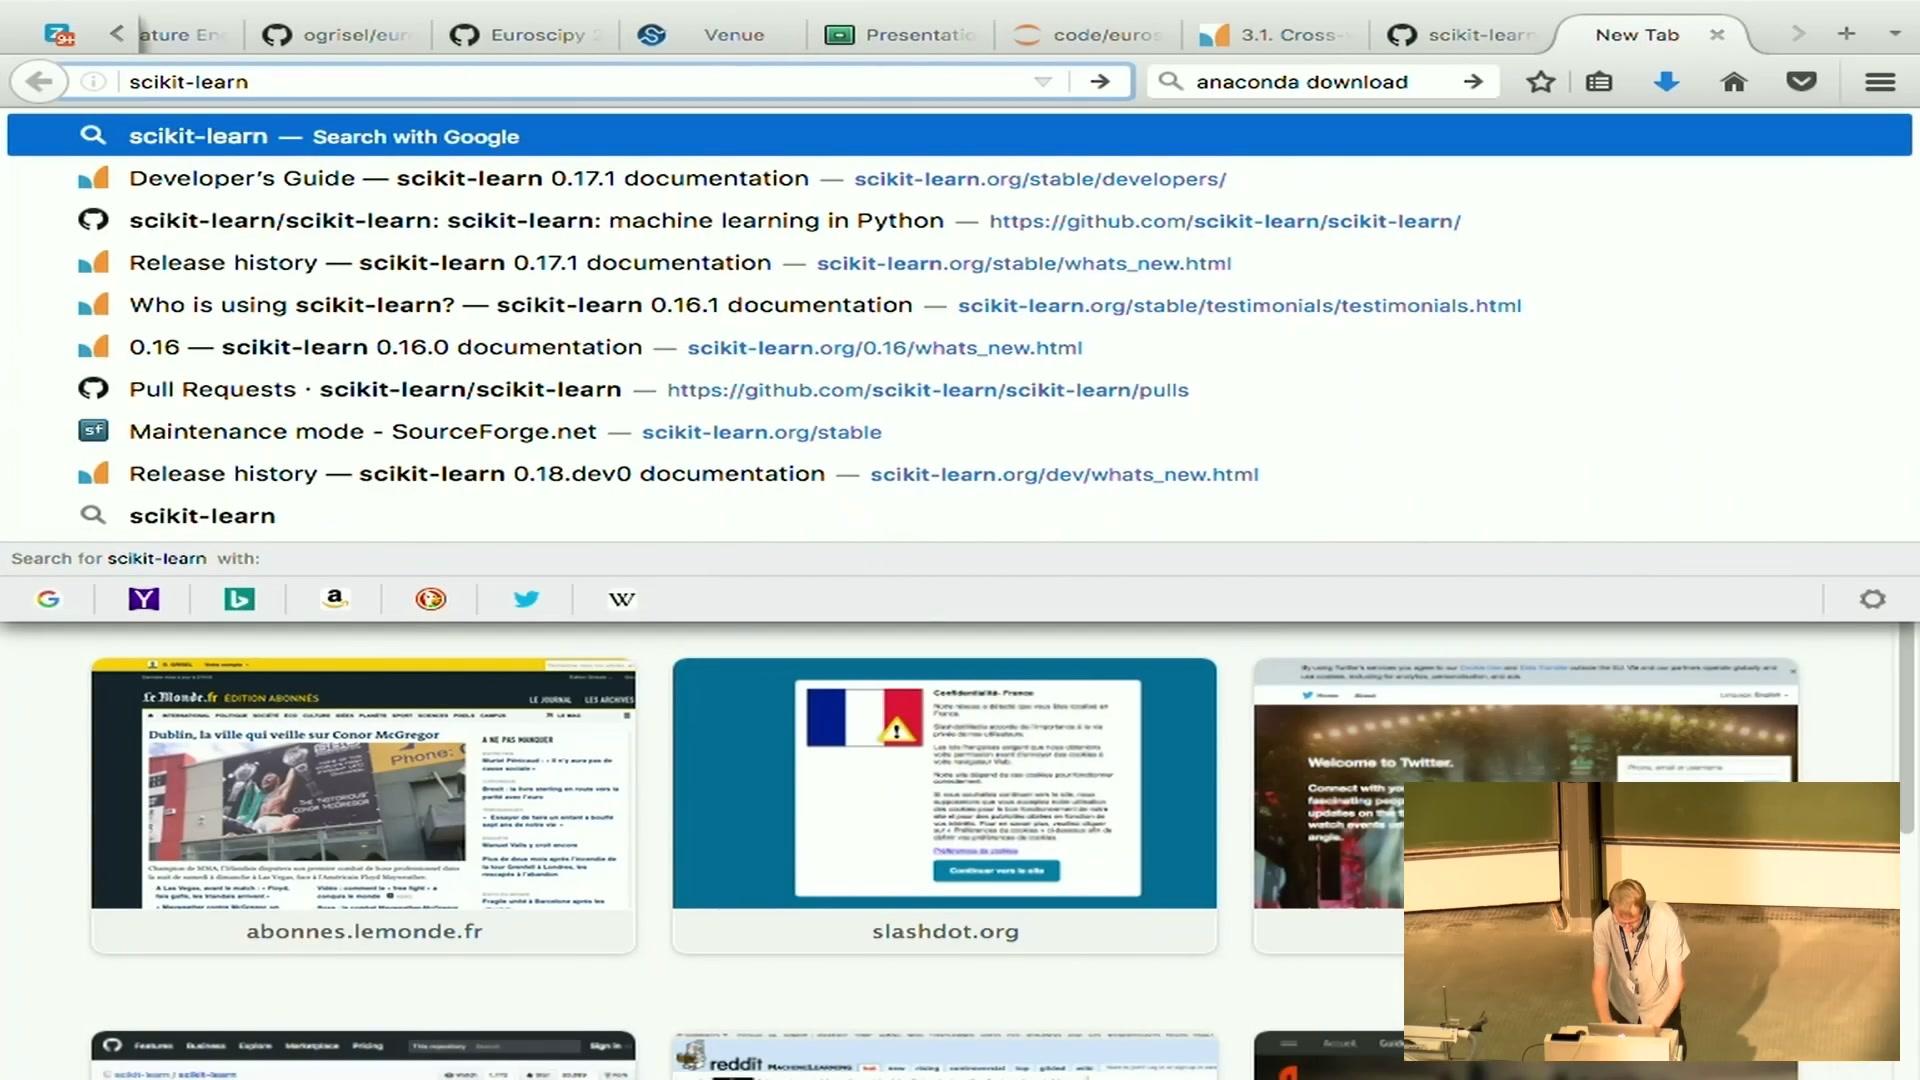 media ccc de - Scikit-learn (2/2)